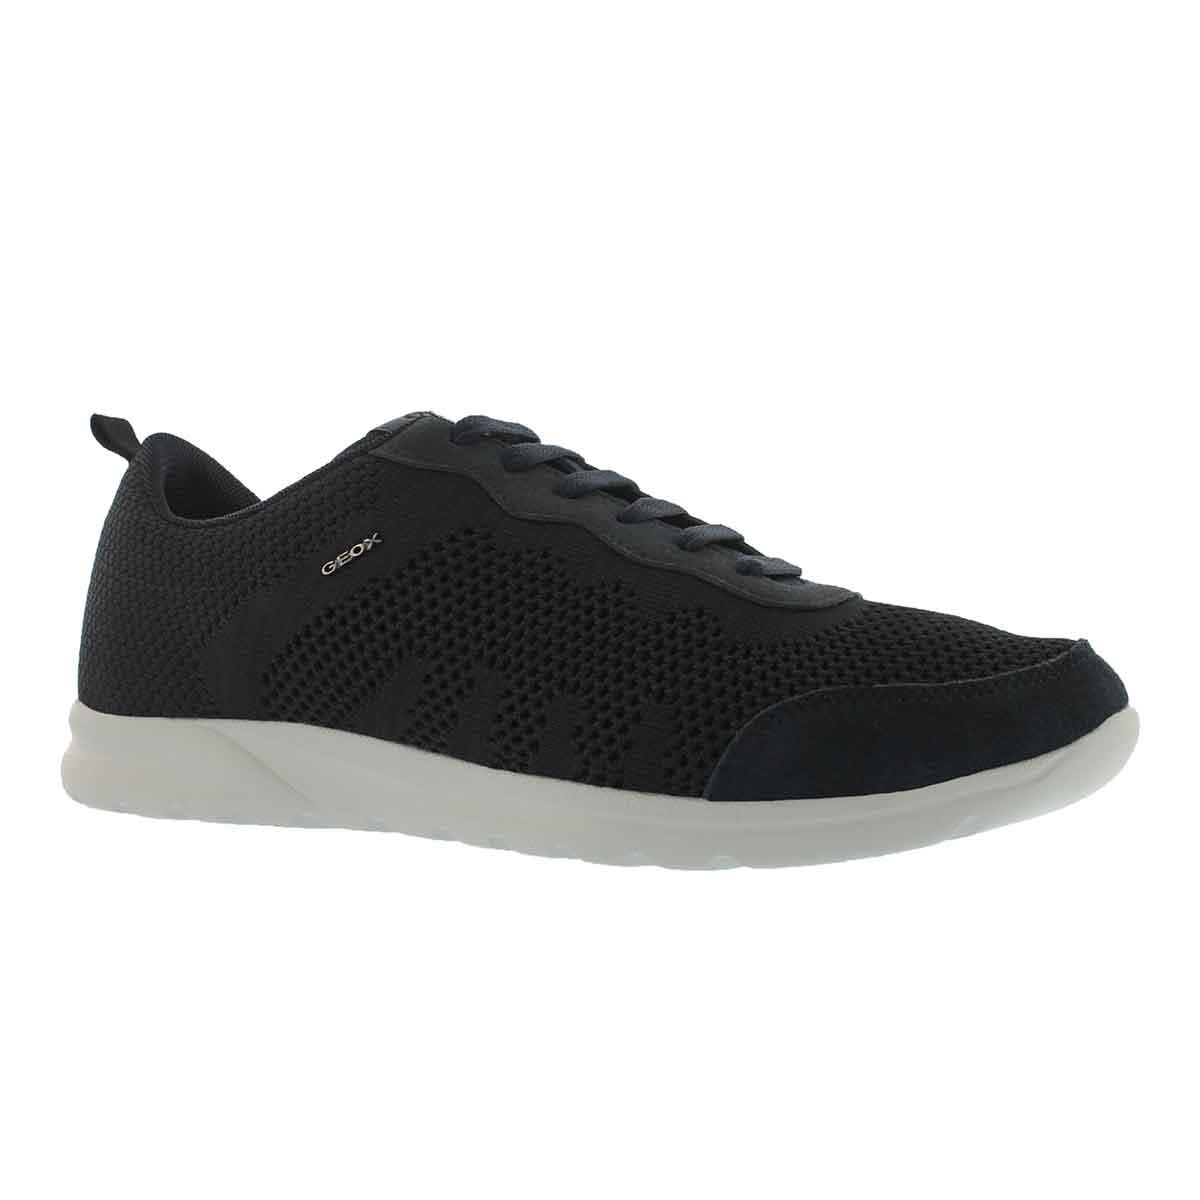 Men's ERAST navy fashion sneakers